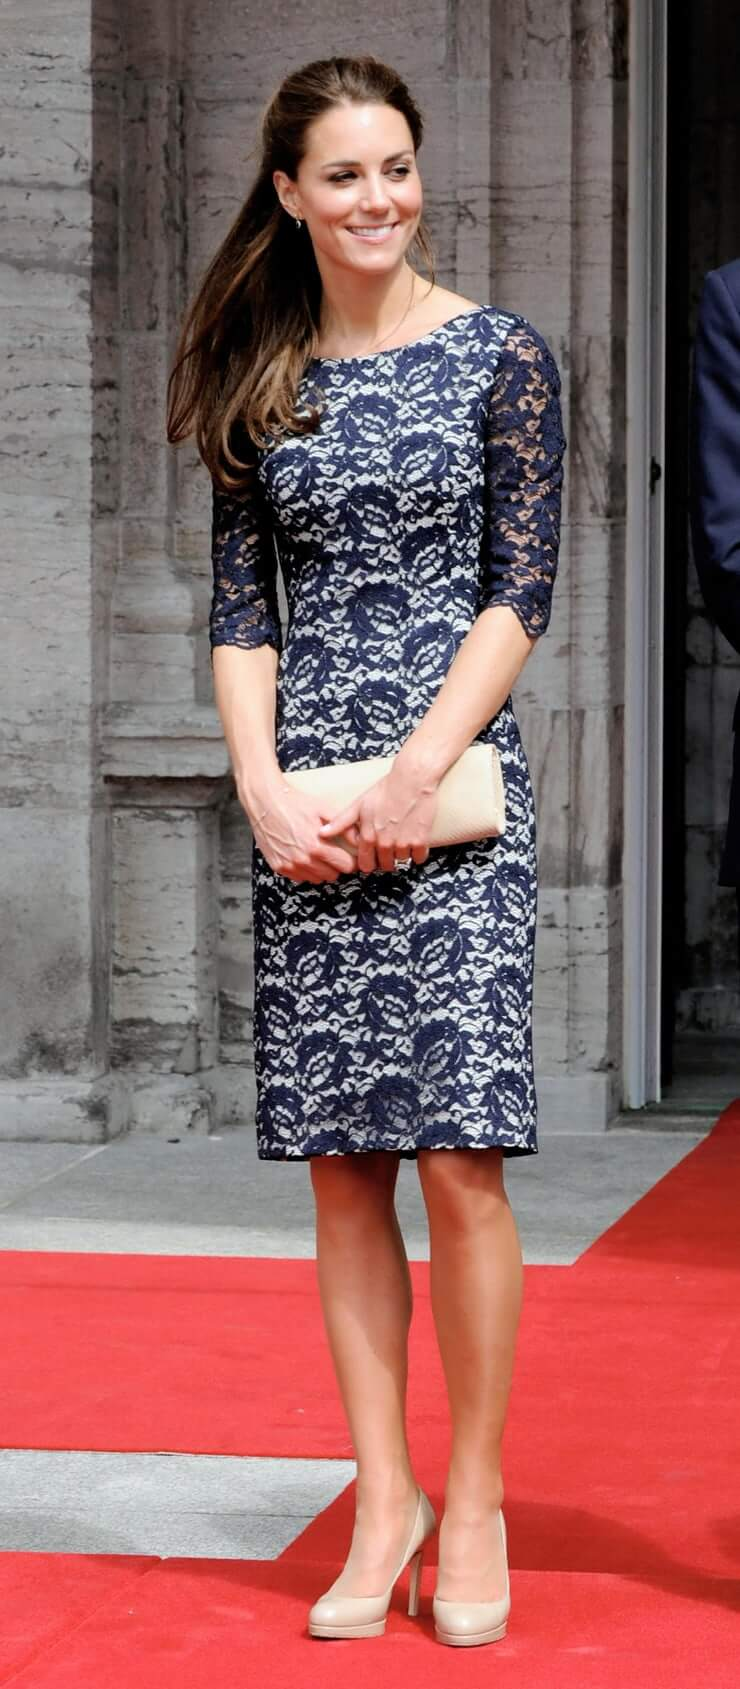 Catherine, Duchess of Cambridge feet